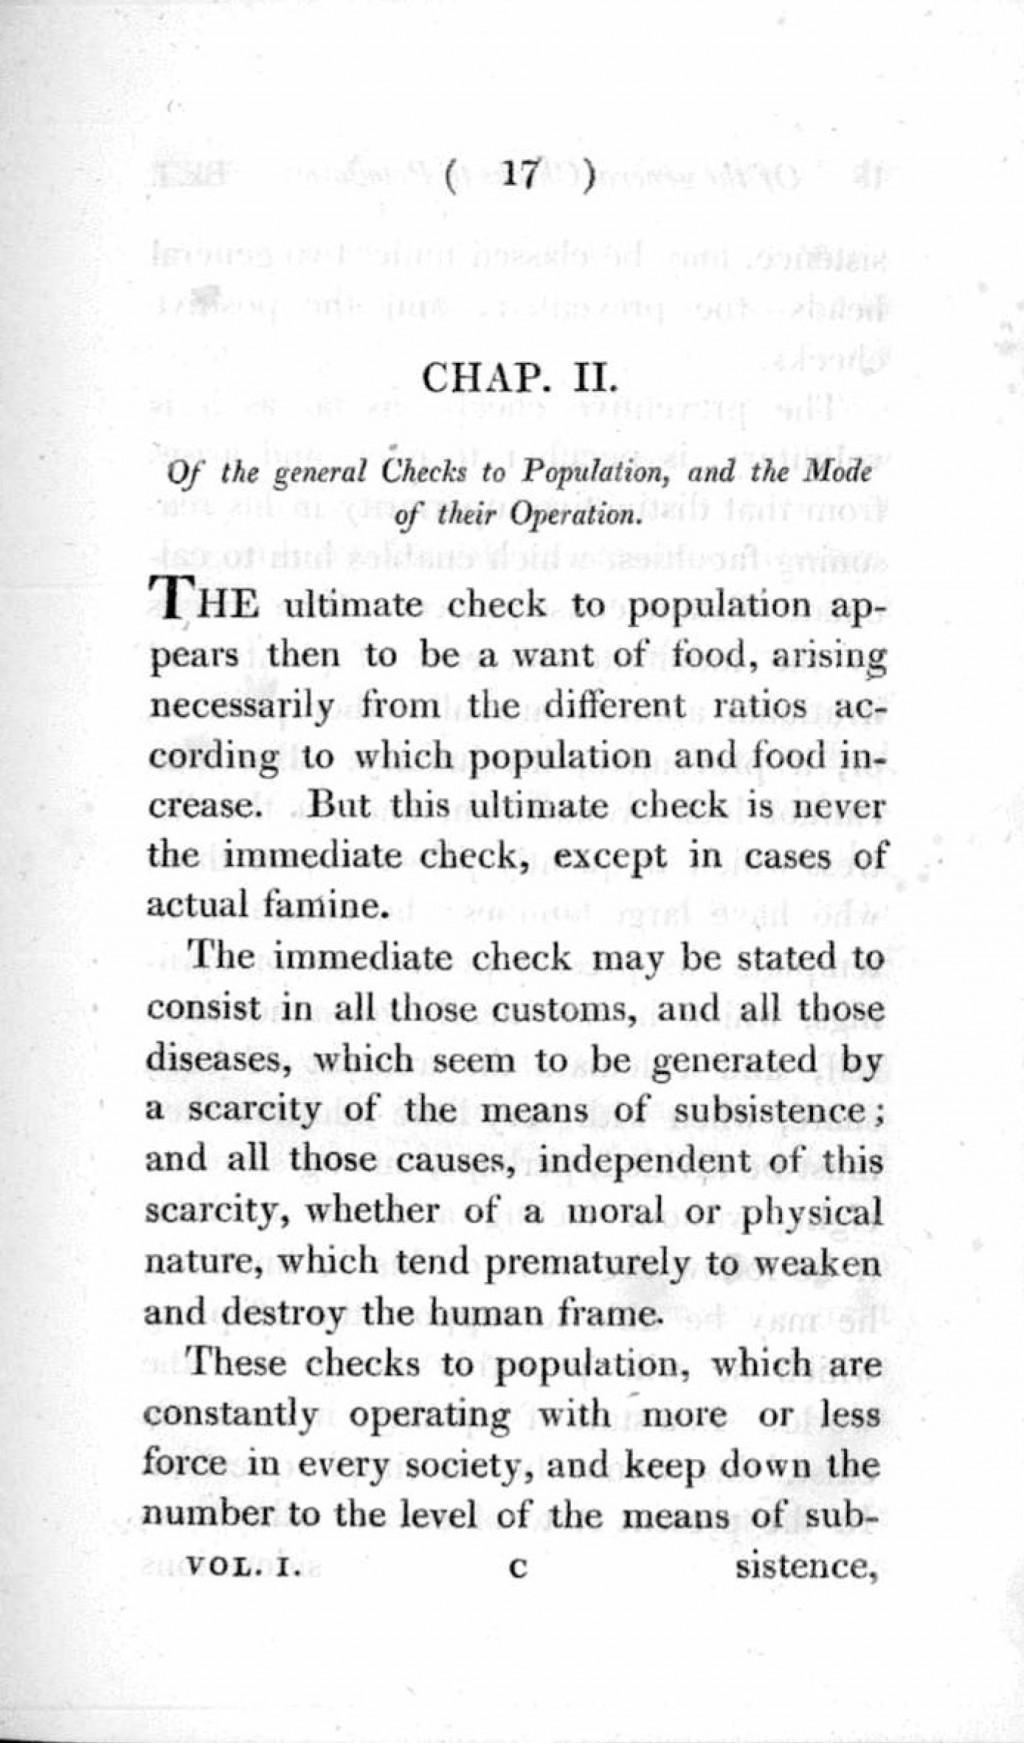 012 Essay Example On The Principle Of Singular Population Pdf By Thomas Malthus Main Idea Large